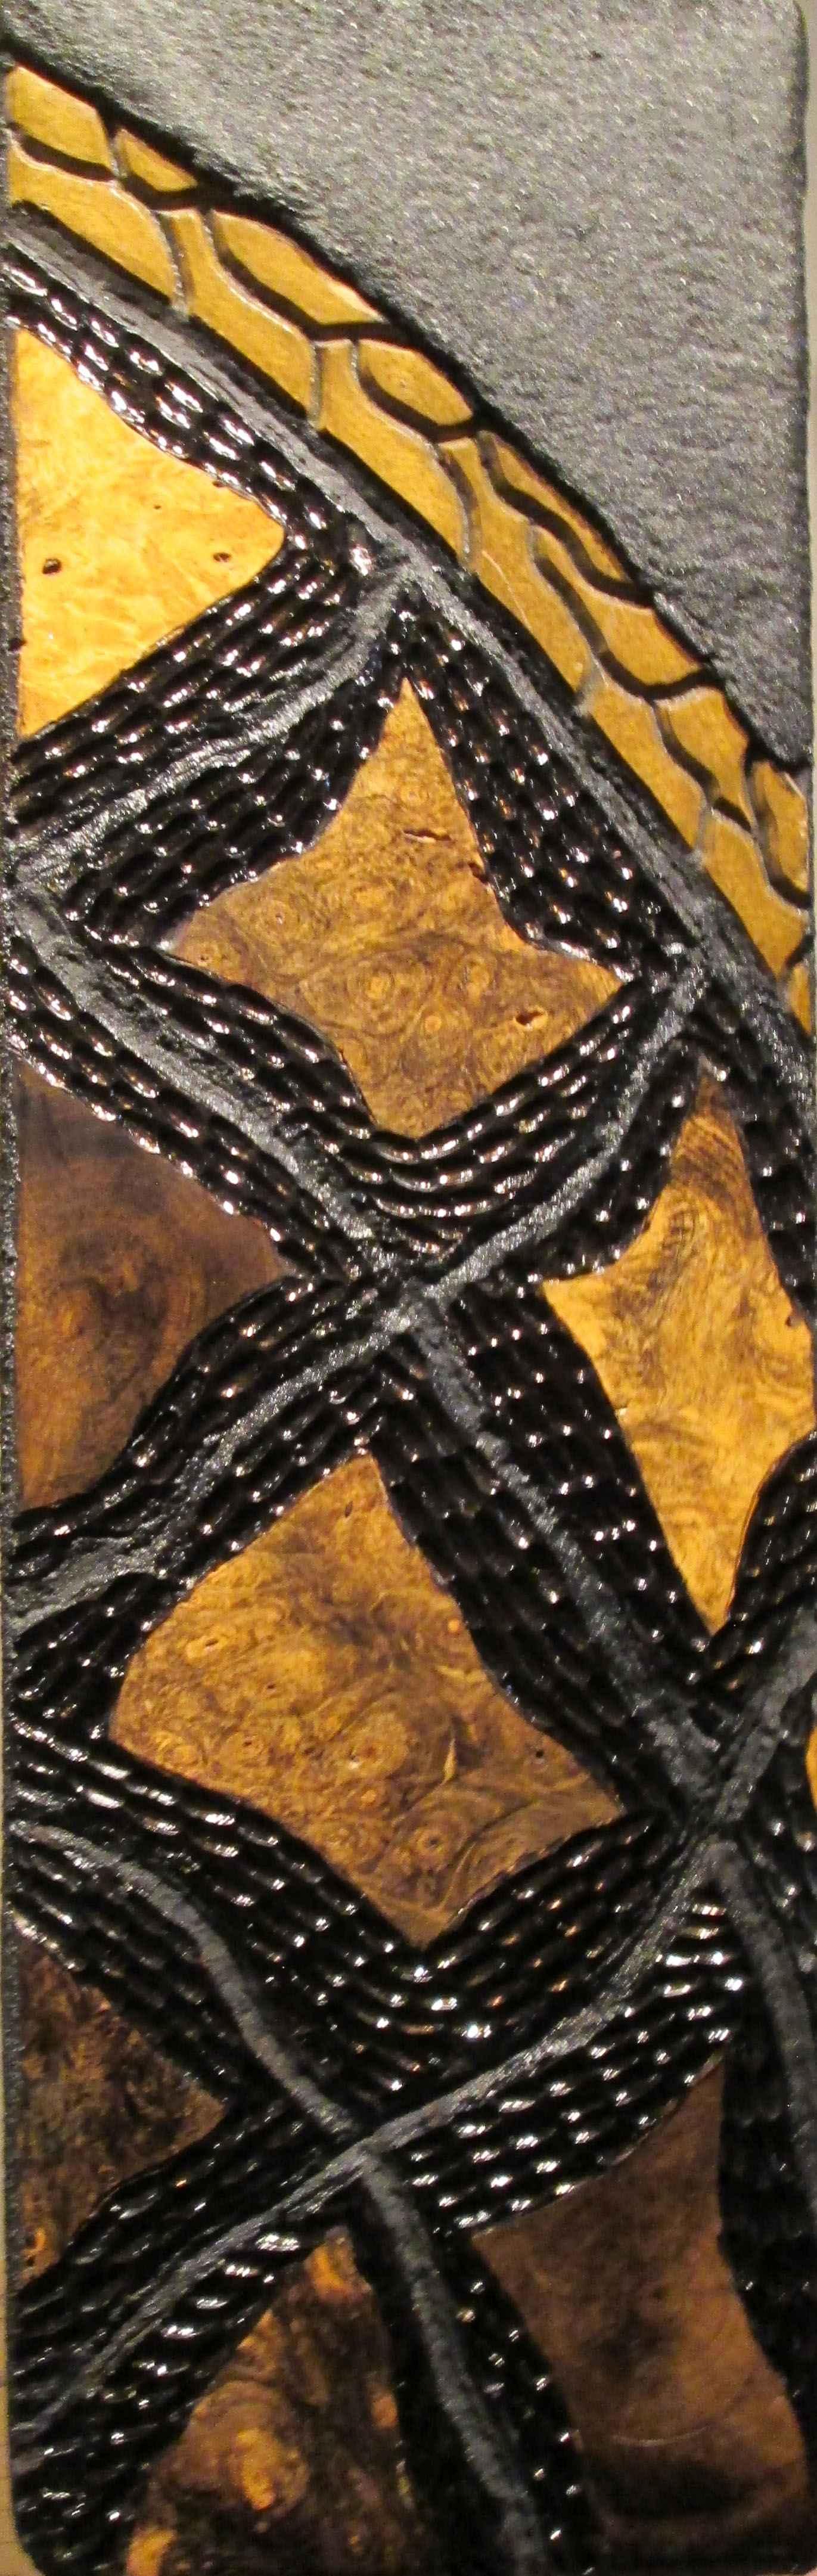 Buckeye Babies 3 by   Frasca-Halliday - Masterpiece Online